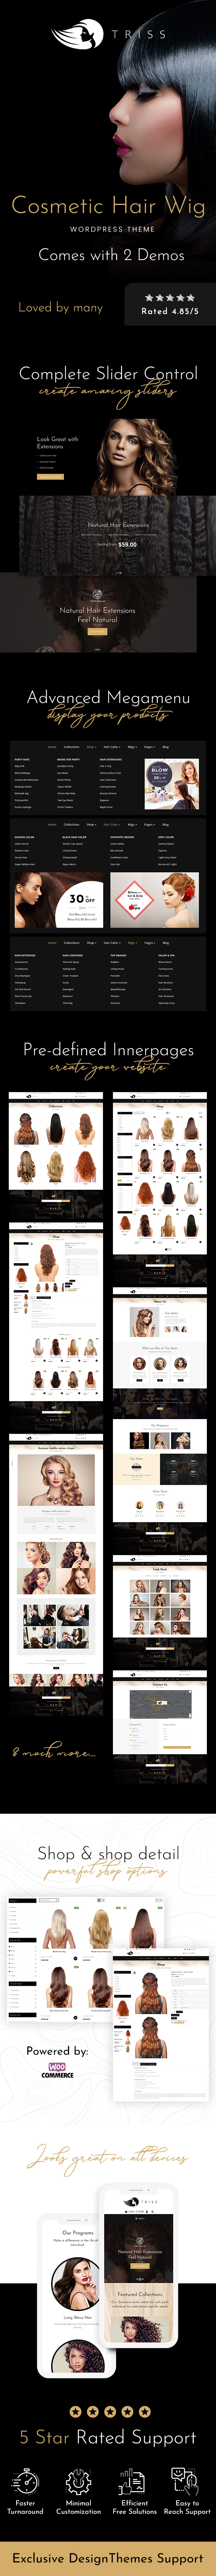 Triss - Salon, Hair Extension & Beauty Store WooCommerce Theme - 1